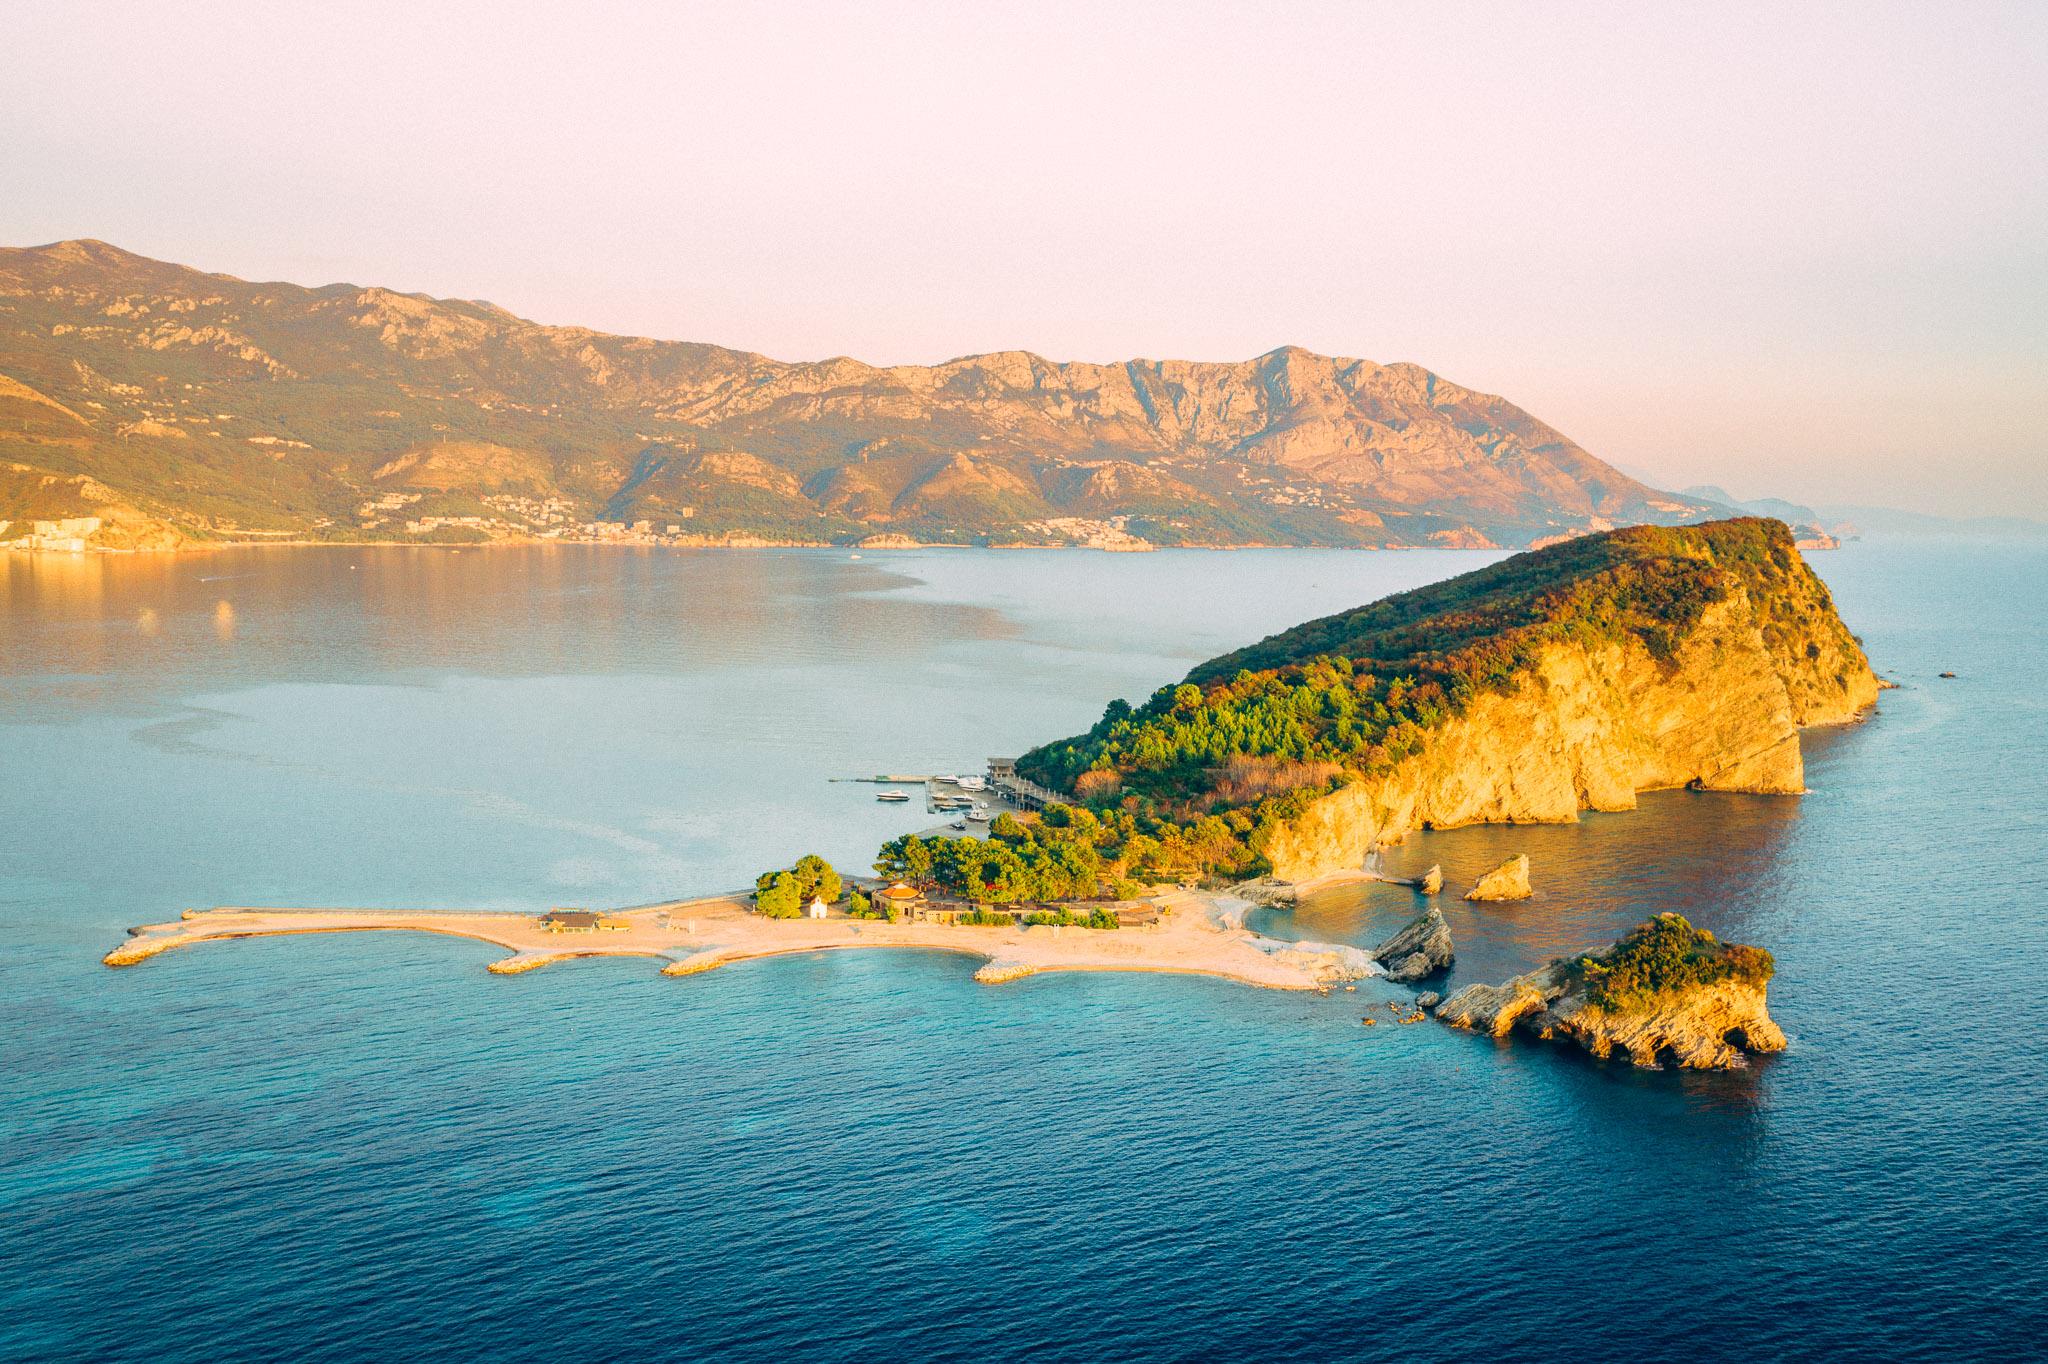 PJ Rankin_Drop in the Ocean_Montenegro-27.jpg